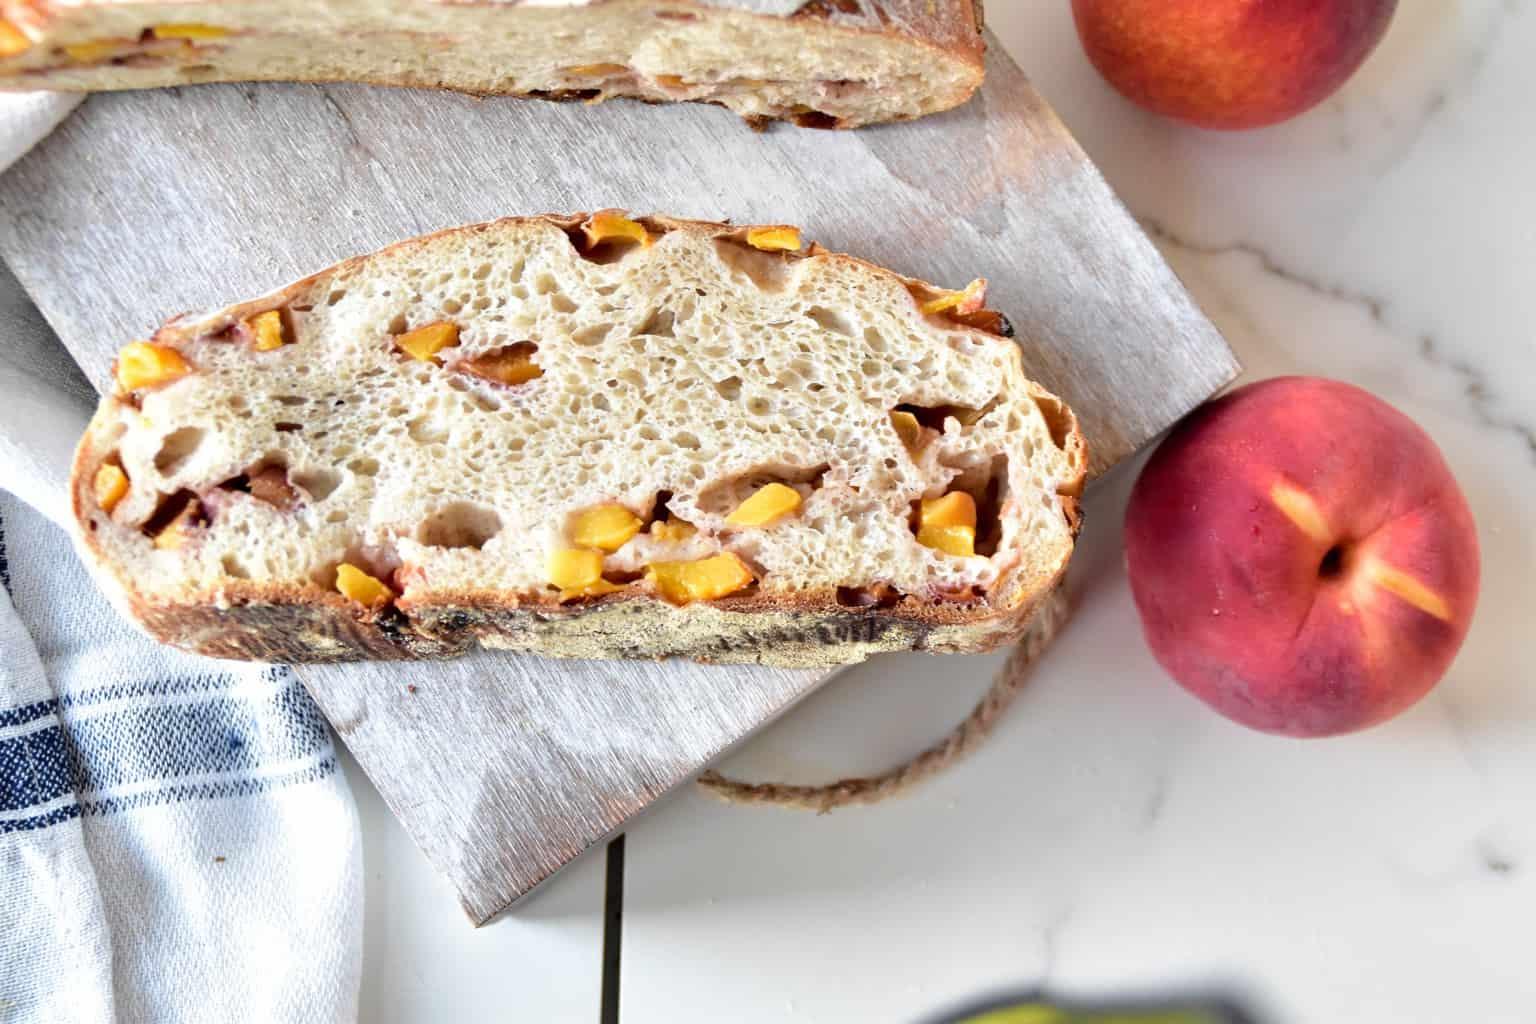 "<img src=""https://cdn.shortpixel.ai/client/q_glossy,ret_img,w_4096,h_2730/peach spelt sourdough bread .jpg"" alt="" slice of peach spelt sourdough bread with peaches"">"